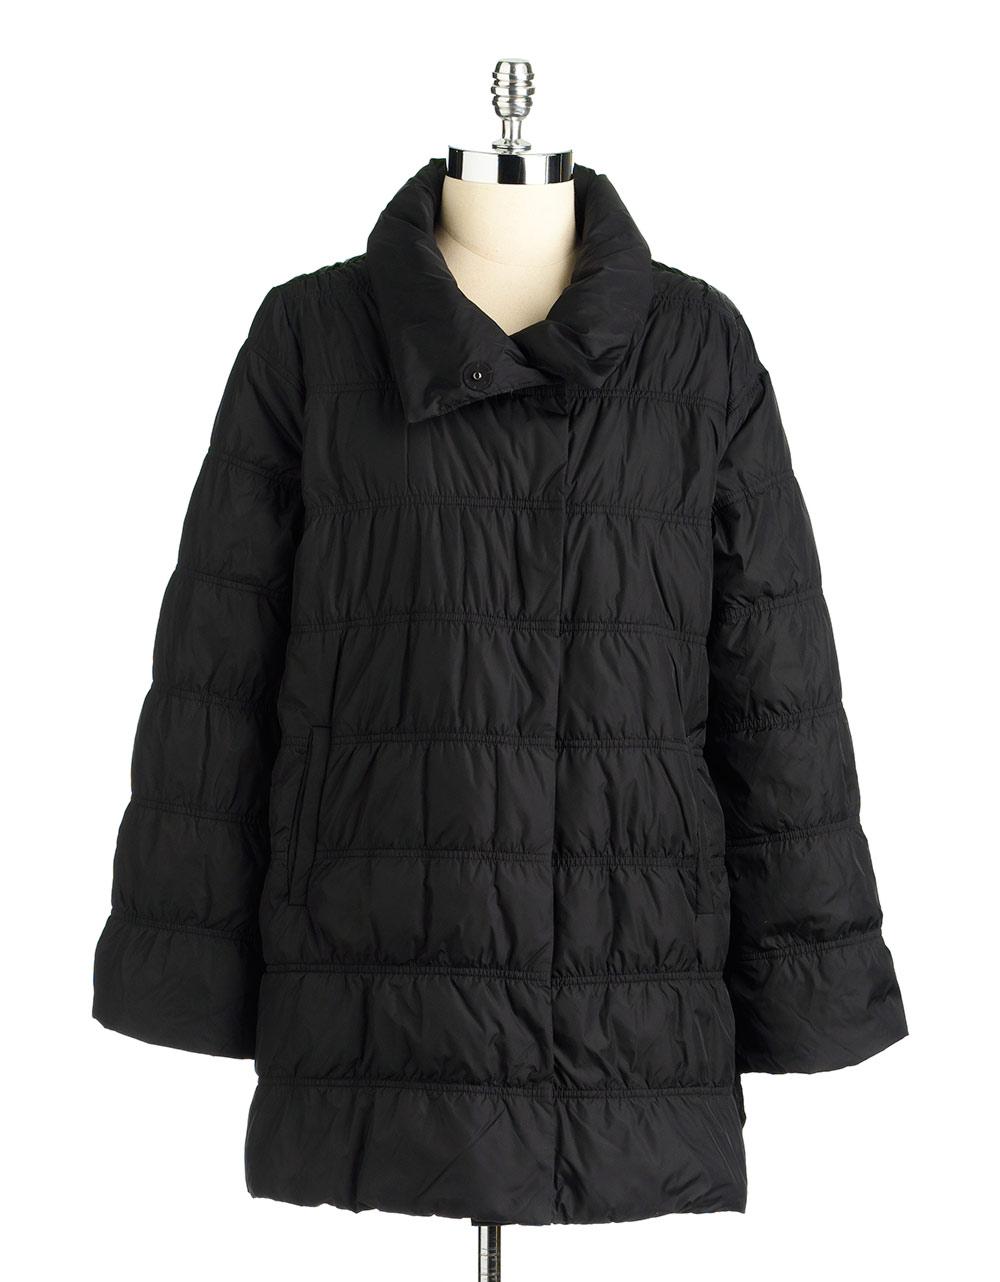 Eileen Fisher Weather Resistant Down Jacket In Black Lyst